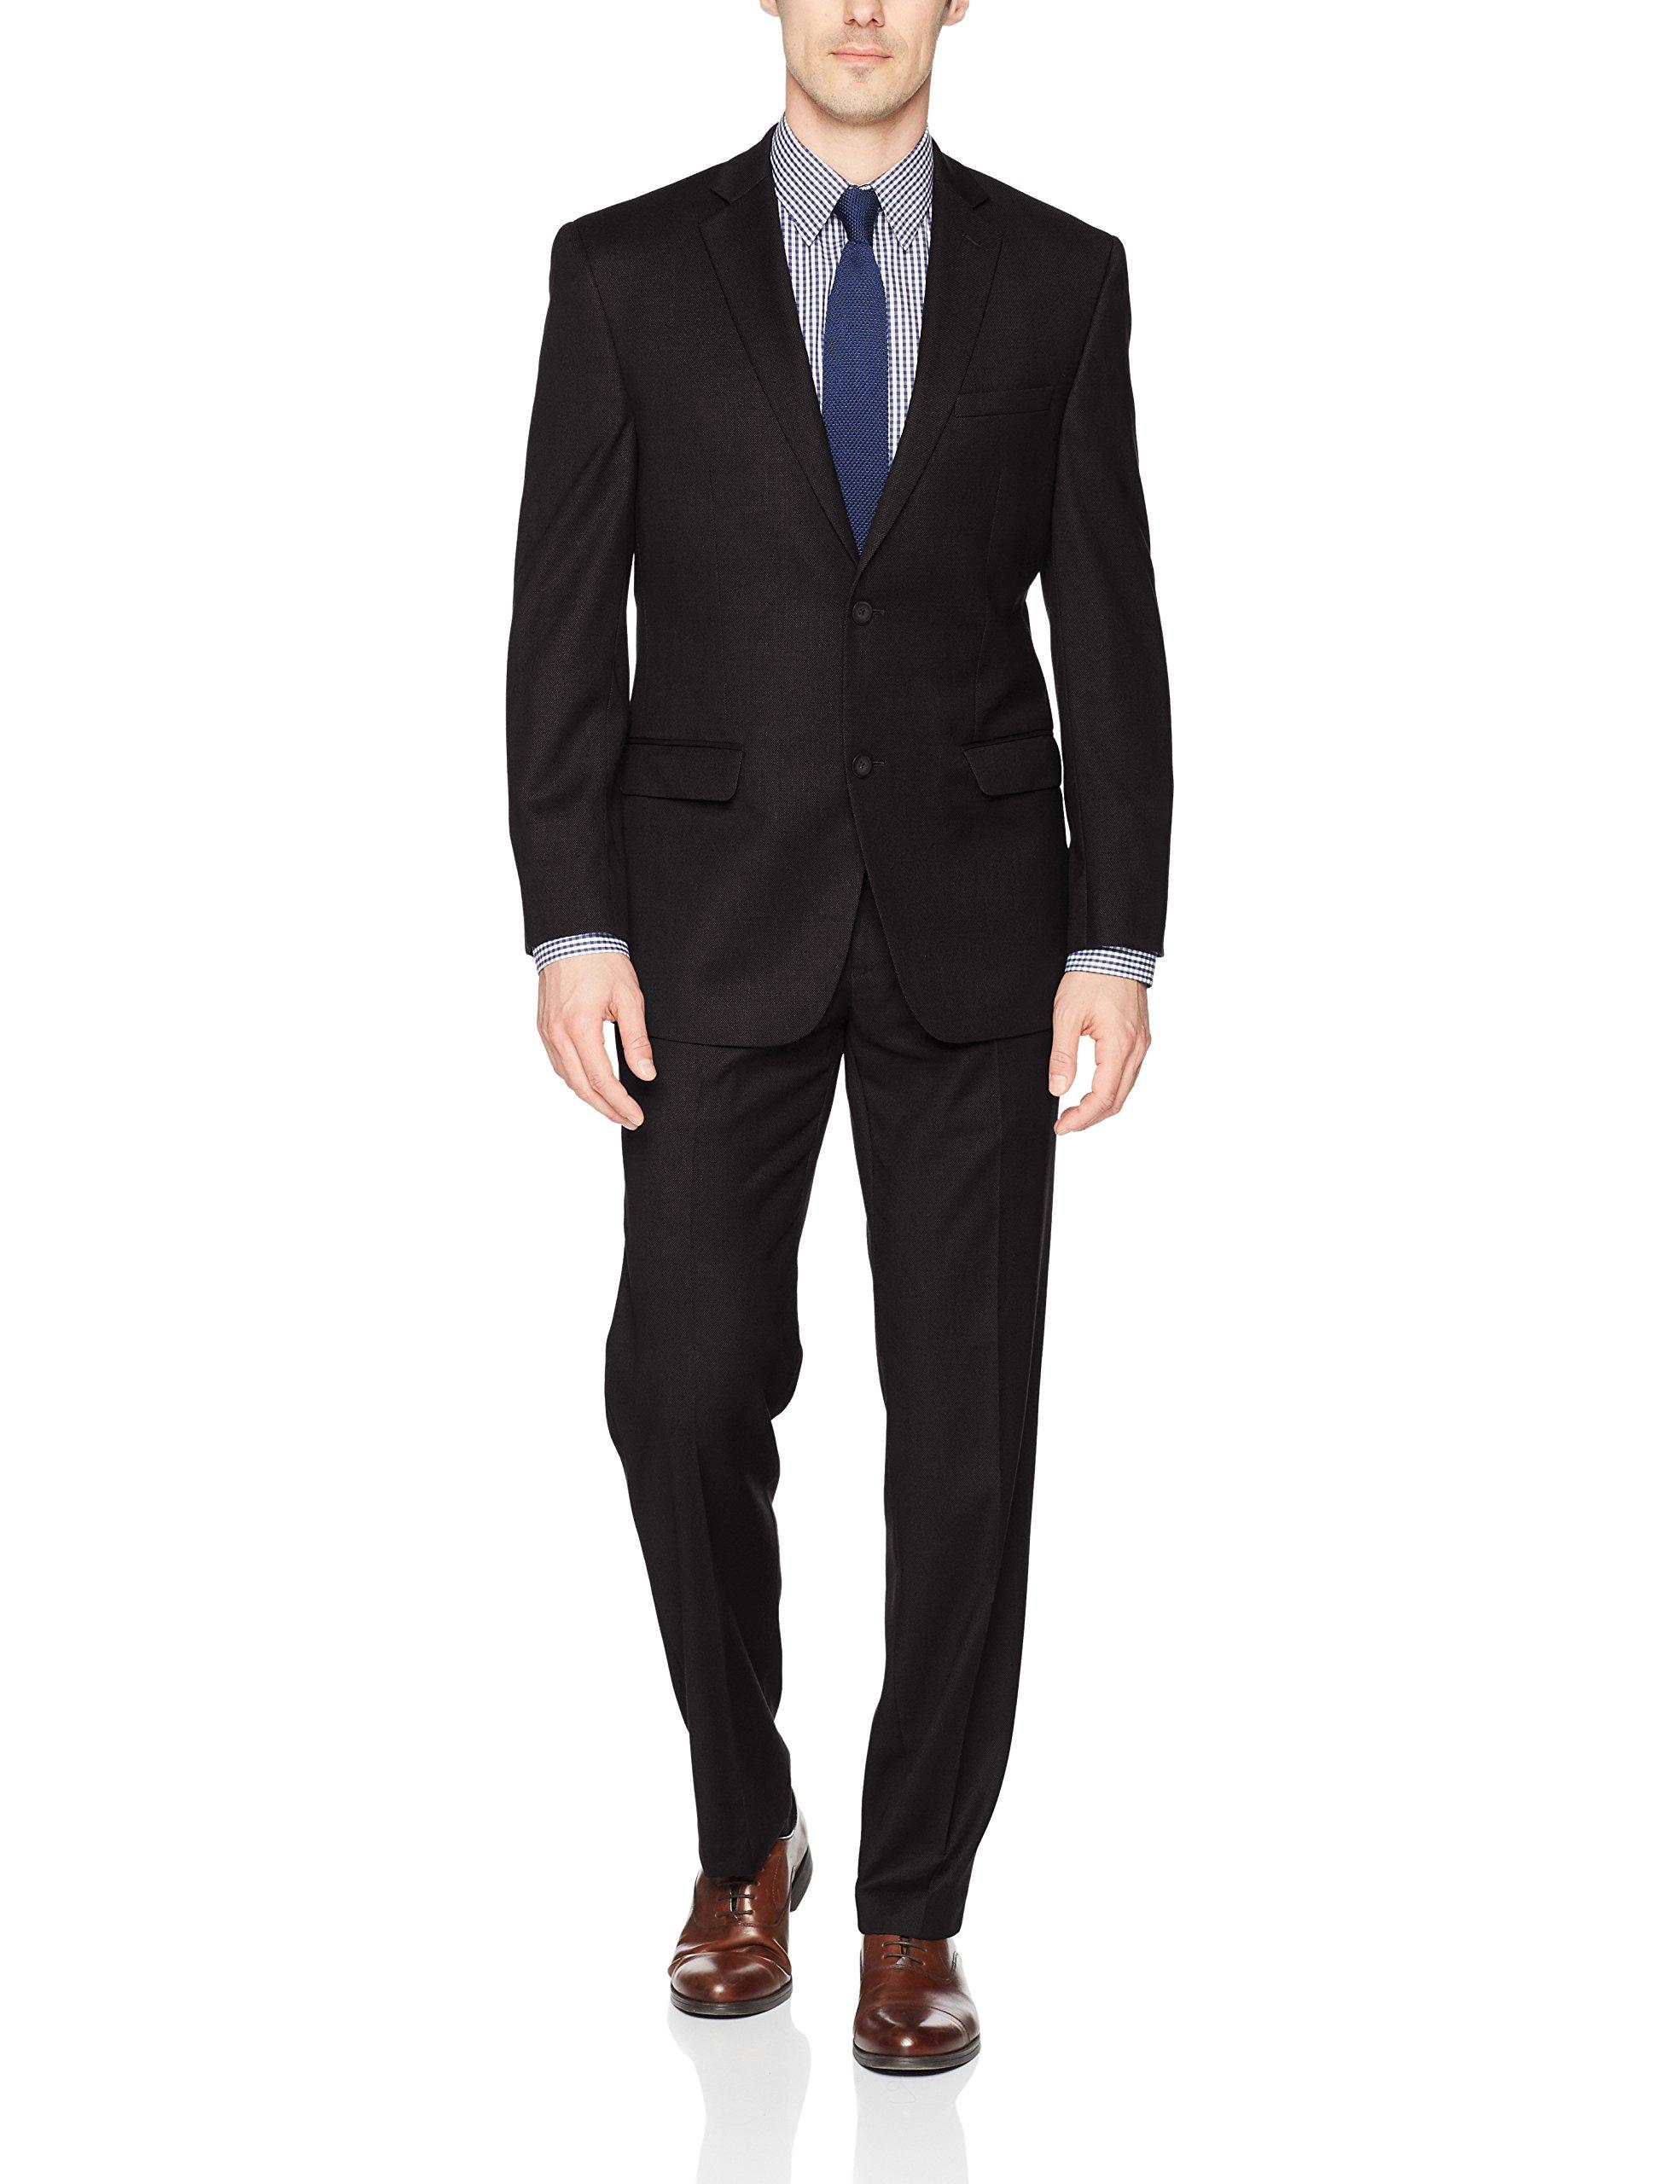 Andrew Marc Men's Slim Fit Ready To Wear Suit, Black, 44 Regular